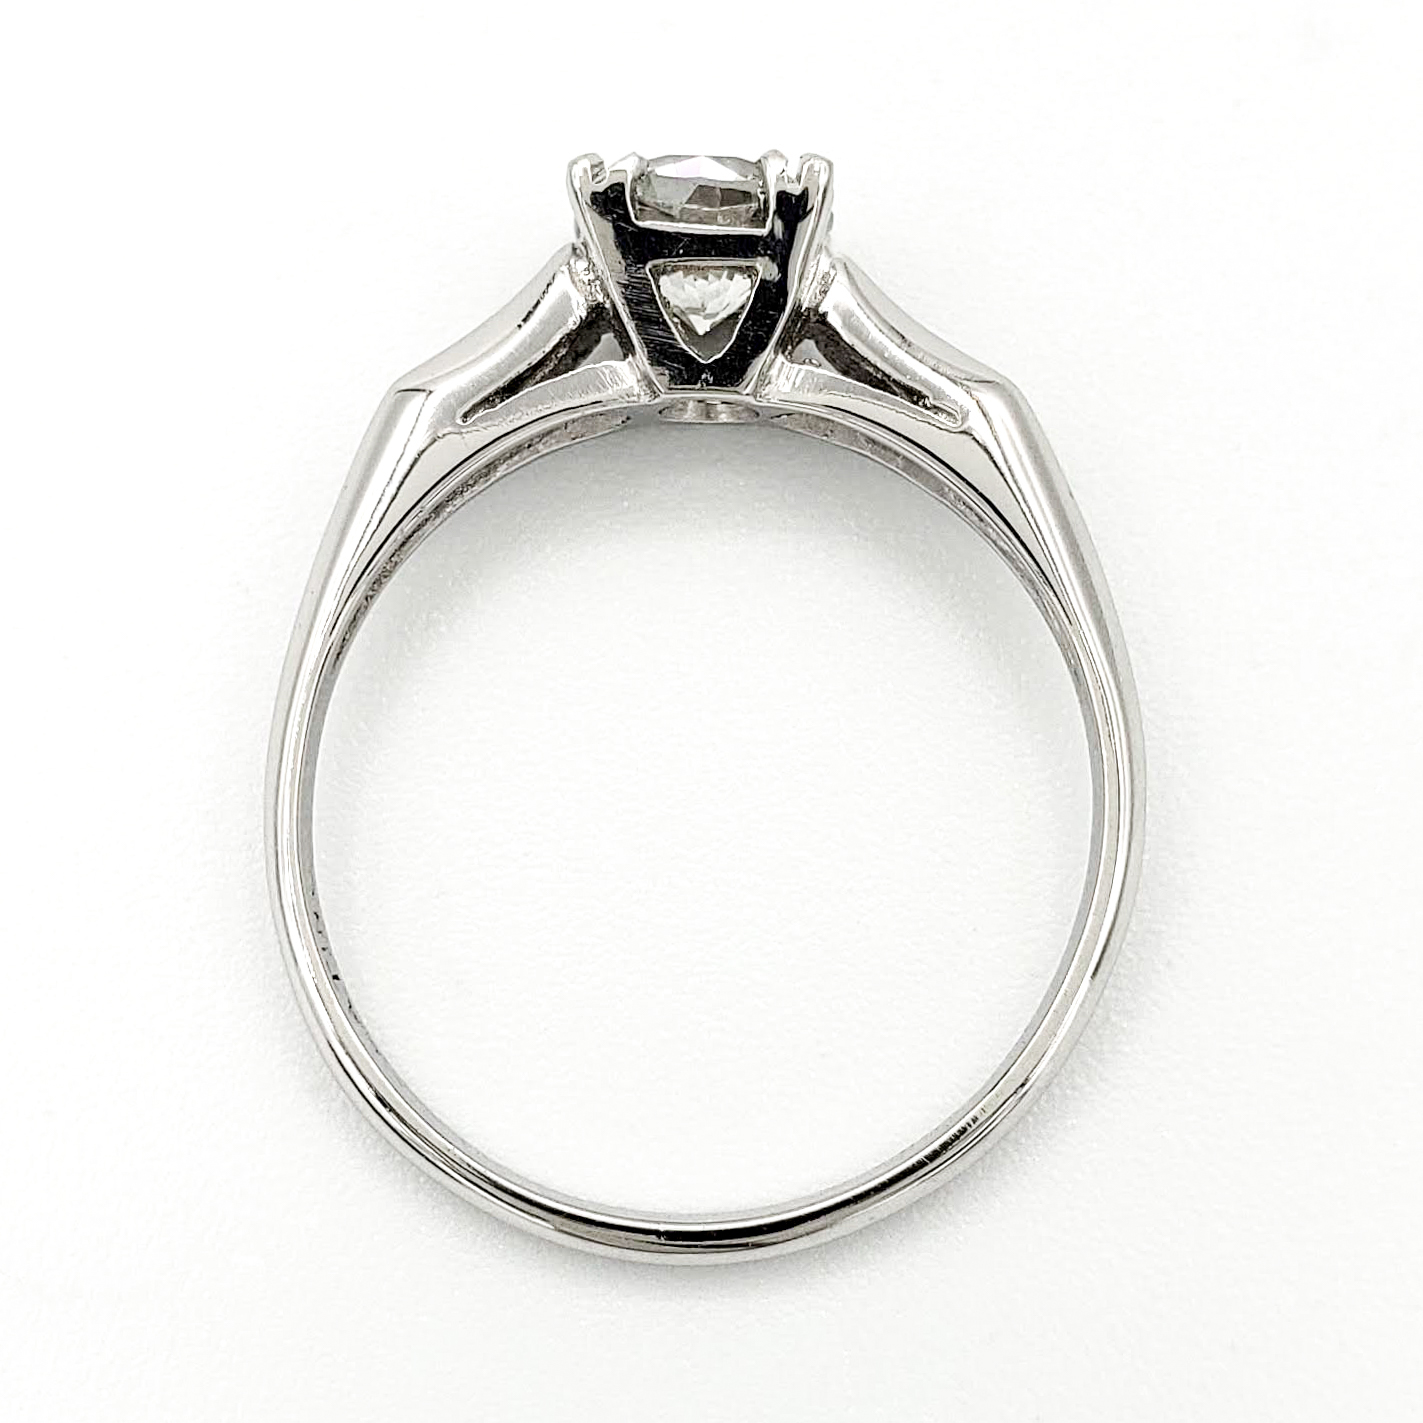 vintage-platinum-engagement-ring-with-0-63-round-brilliant-cut-diamond-egl-g-si1